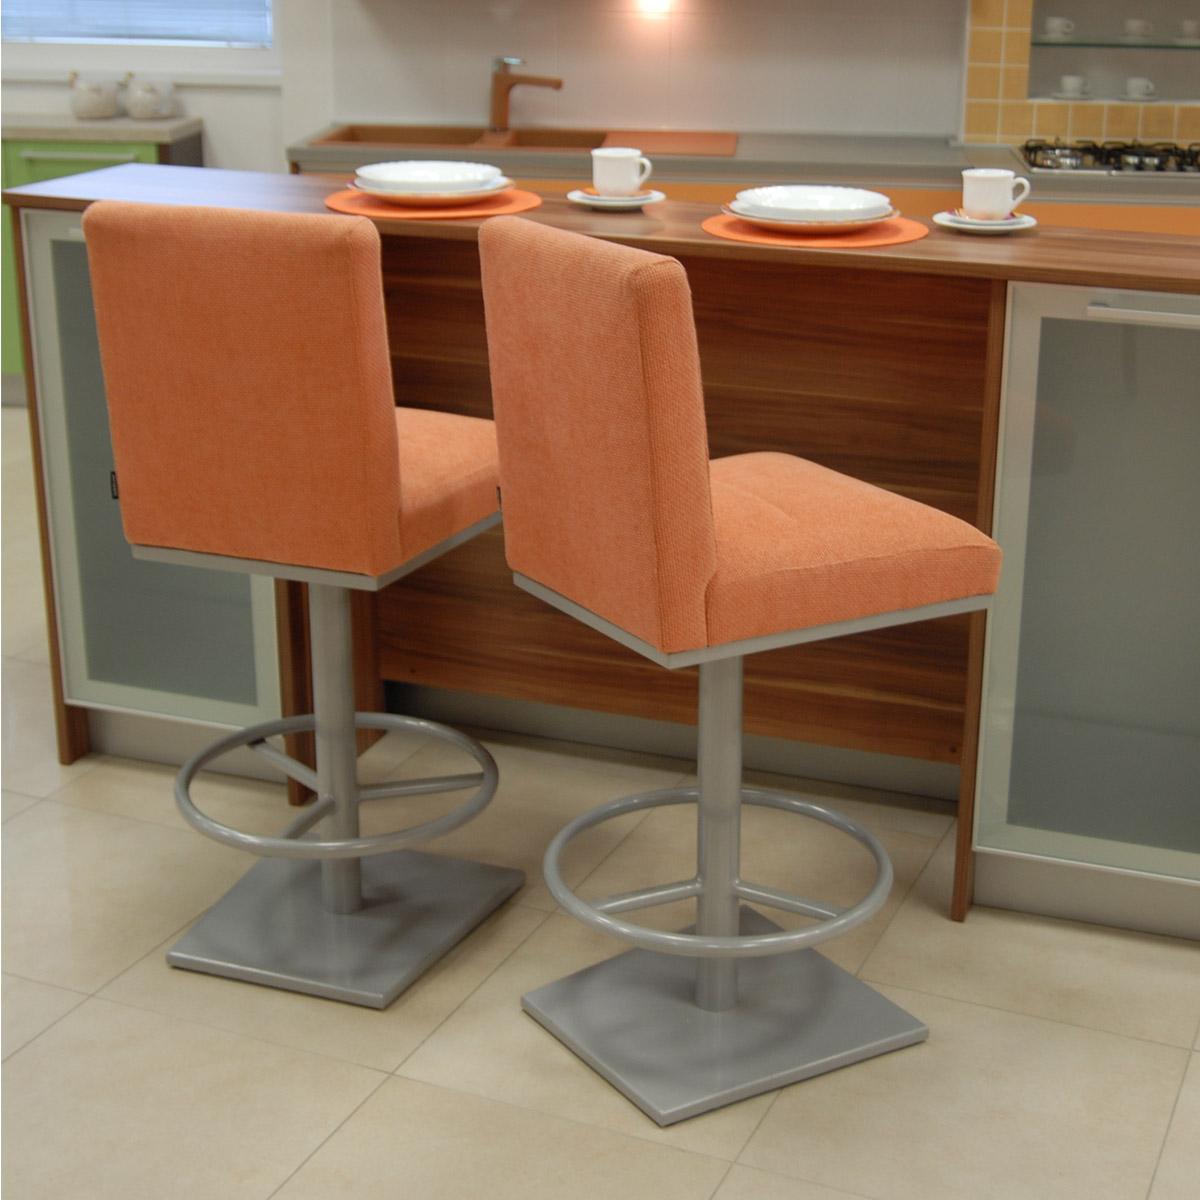 Super Jergy B011 P Bar Stool With Arms Is Used In Casinos Bars Creativecarmelina Interior Chair Design Creativecarmelinacom